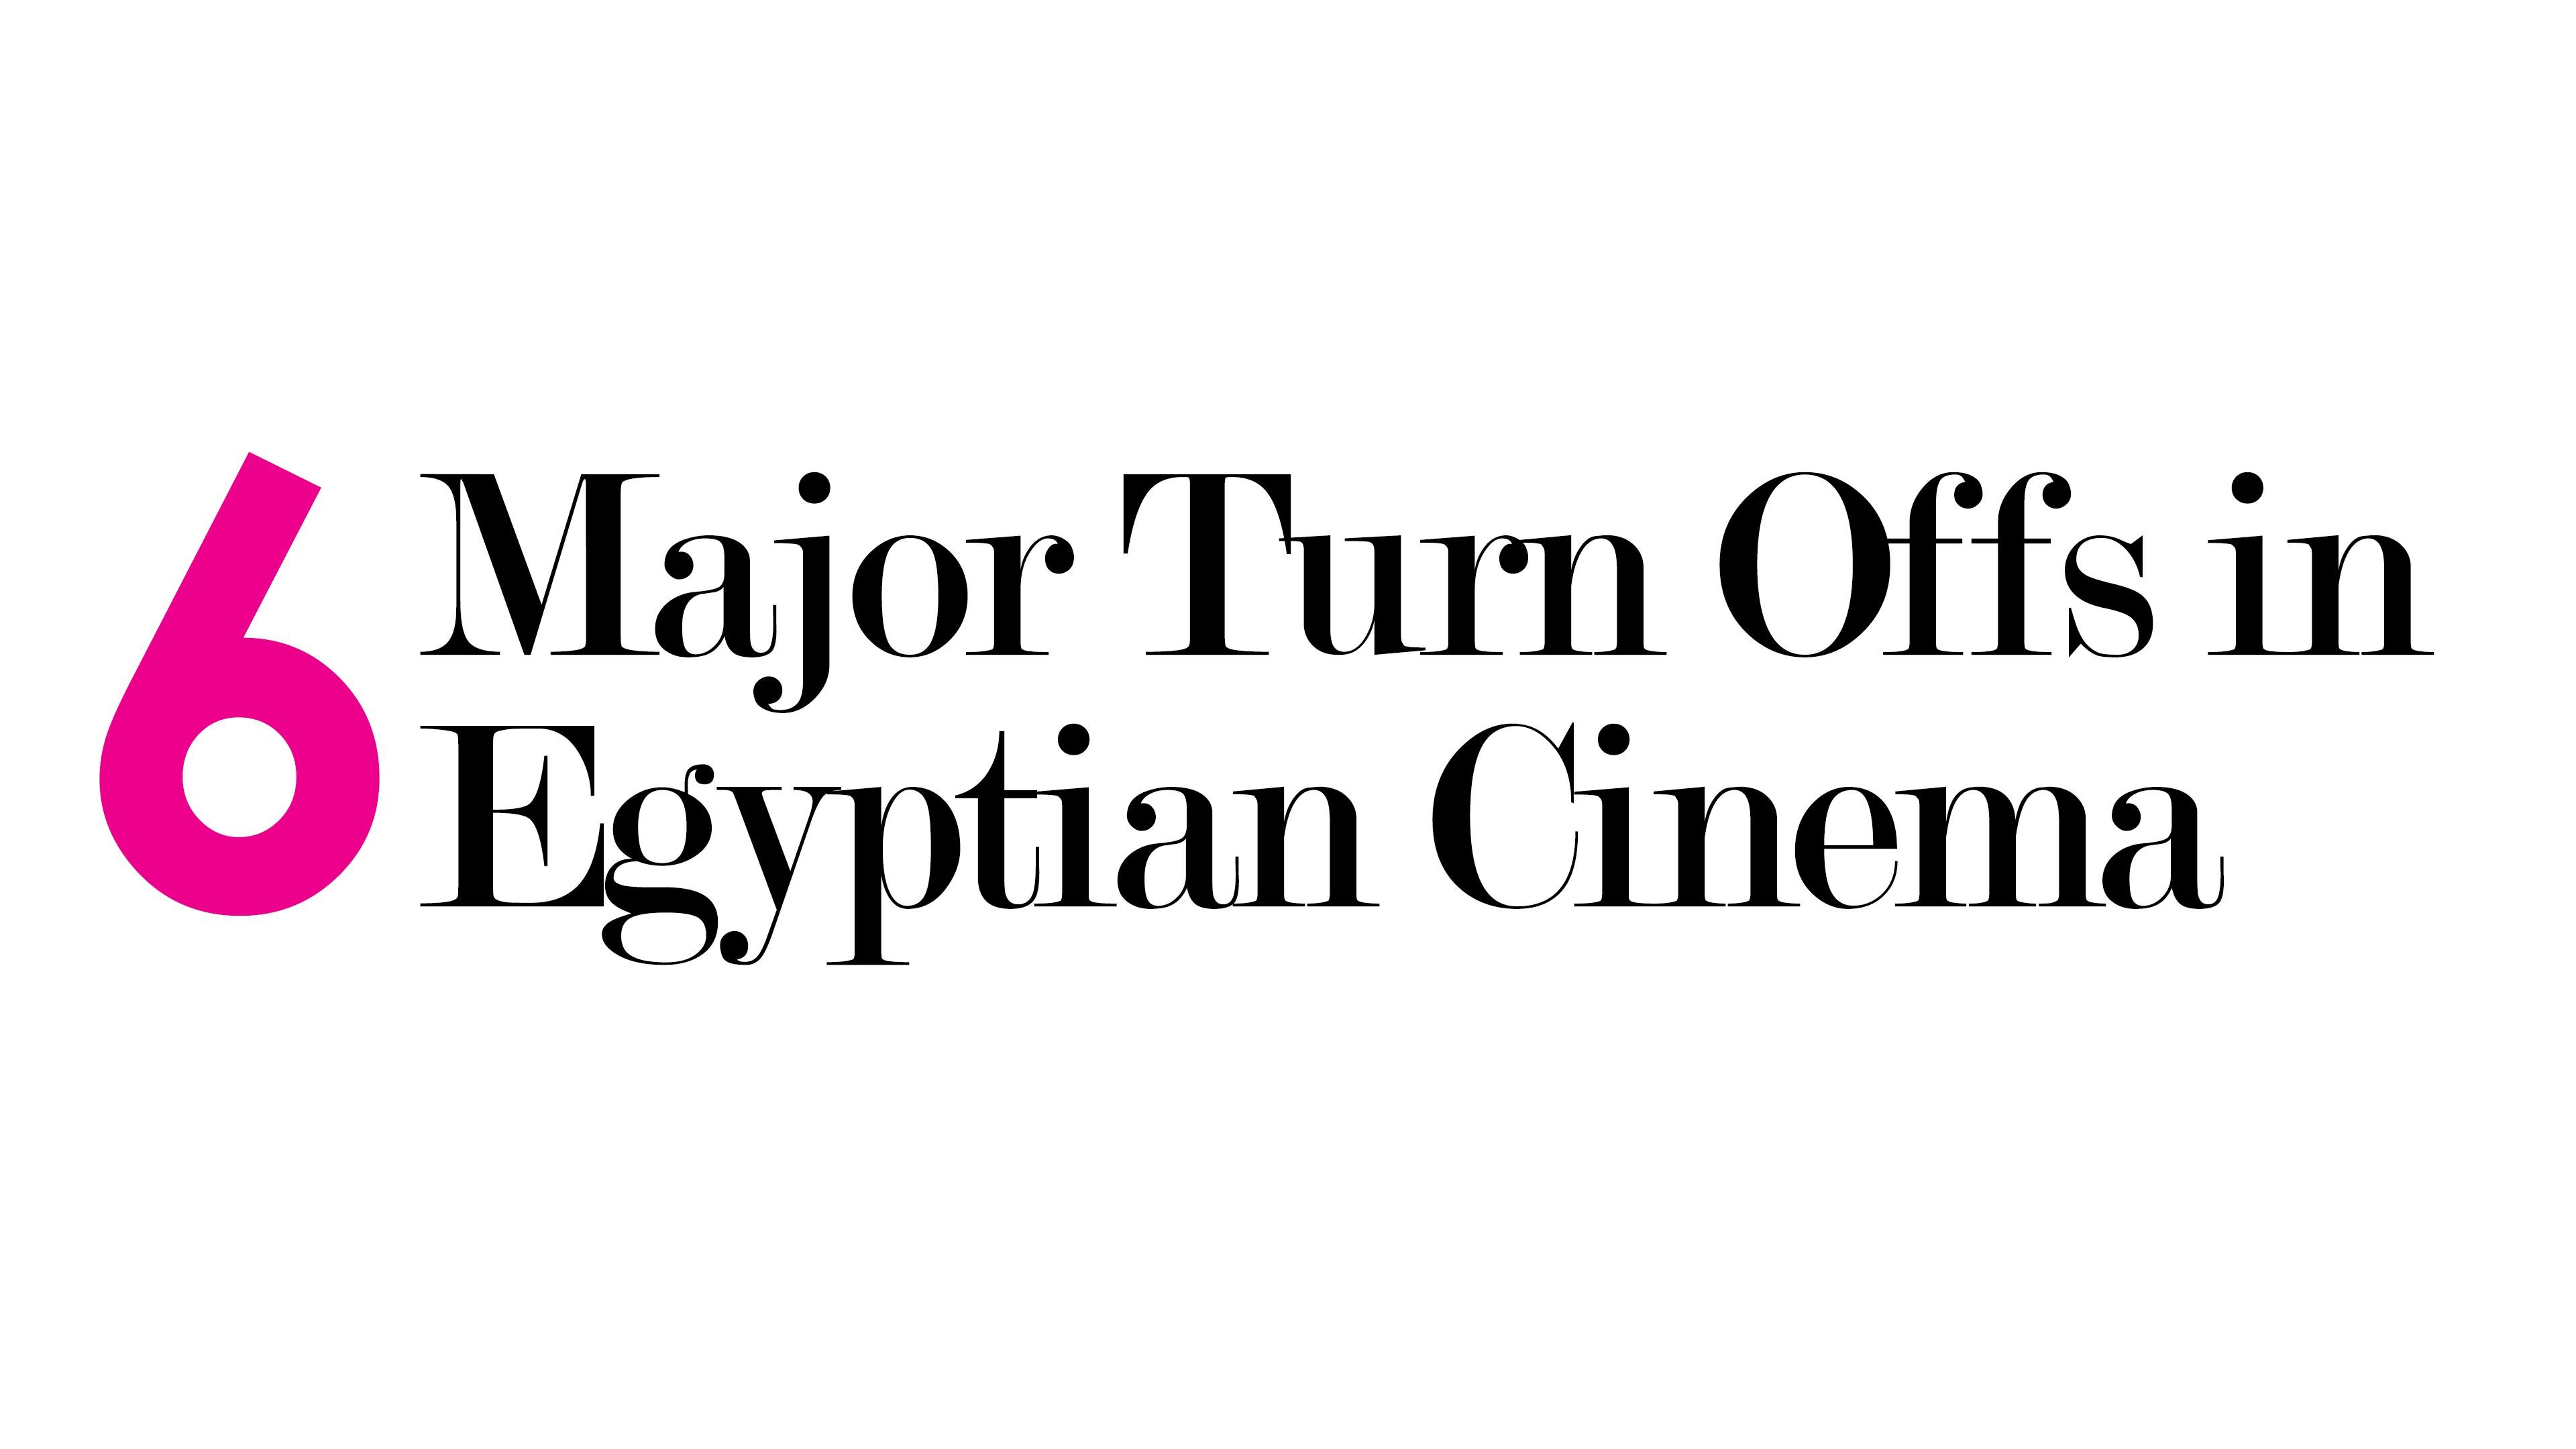 6 Major Turnoffs in Egyptian Cinema